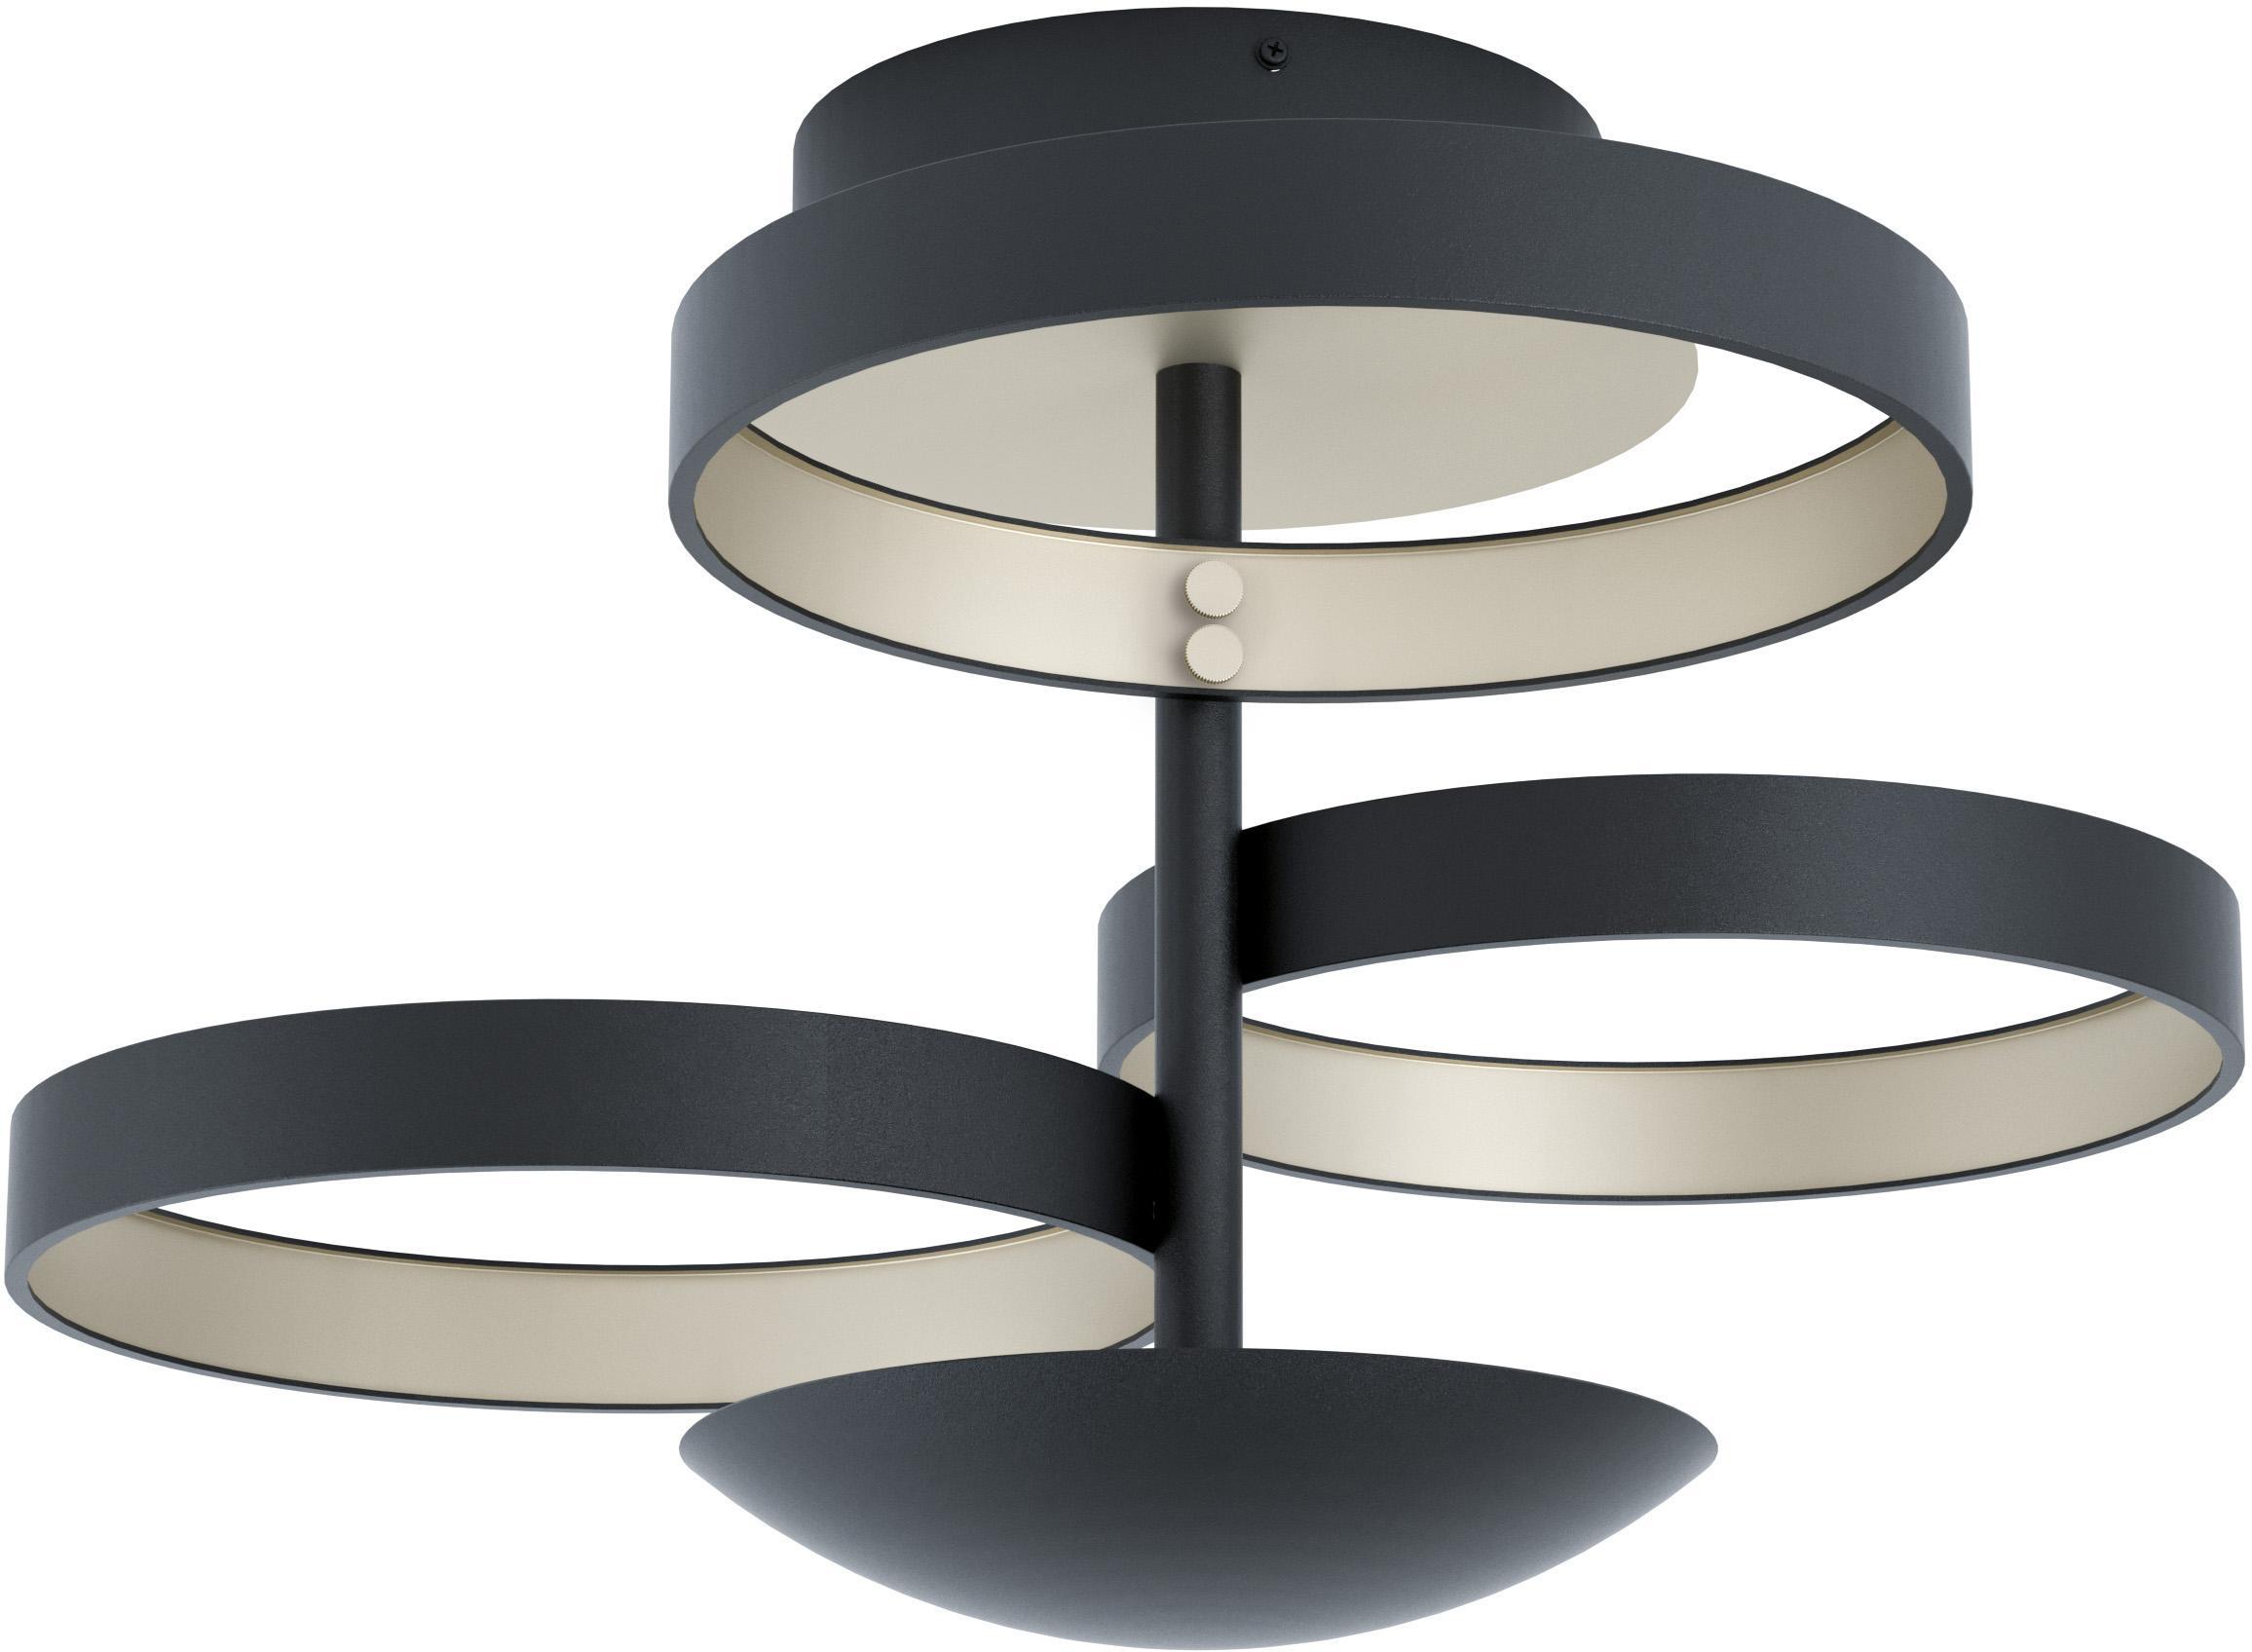 Dimbare LED plafondlamp Gromola, Lampenkap: gelakt aluminium, Baldakijn: gelakt aluminium, Zwart, Ø 54 cm